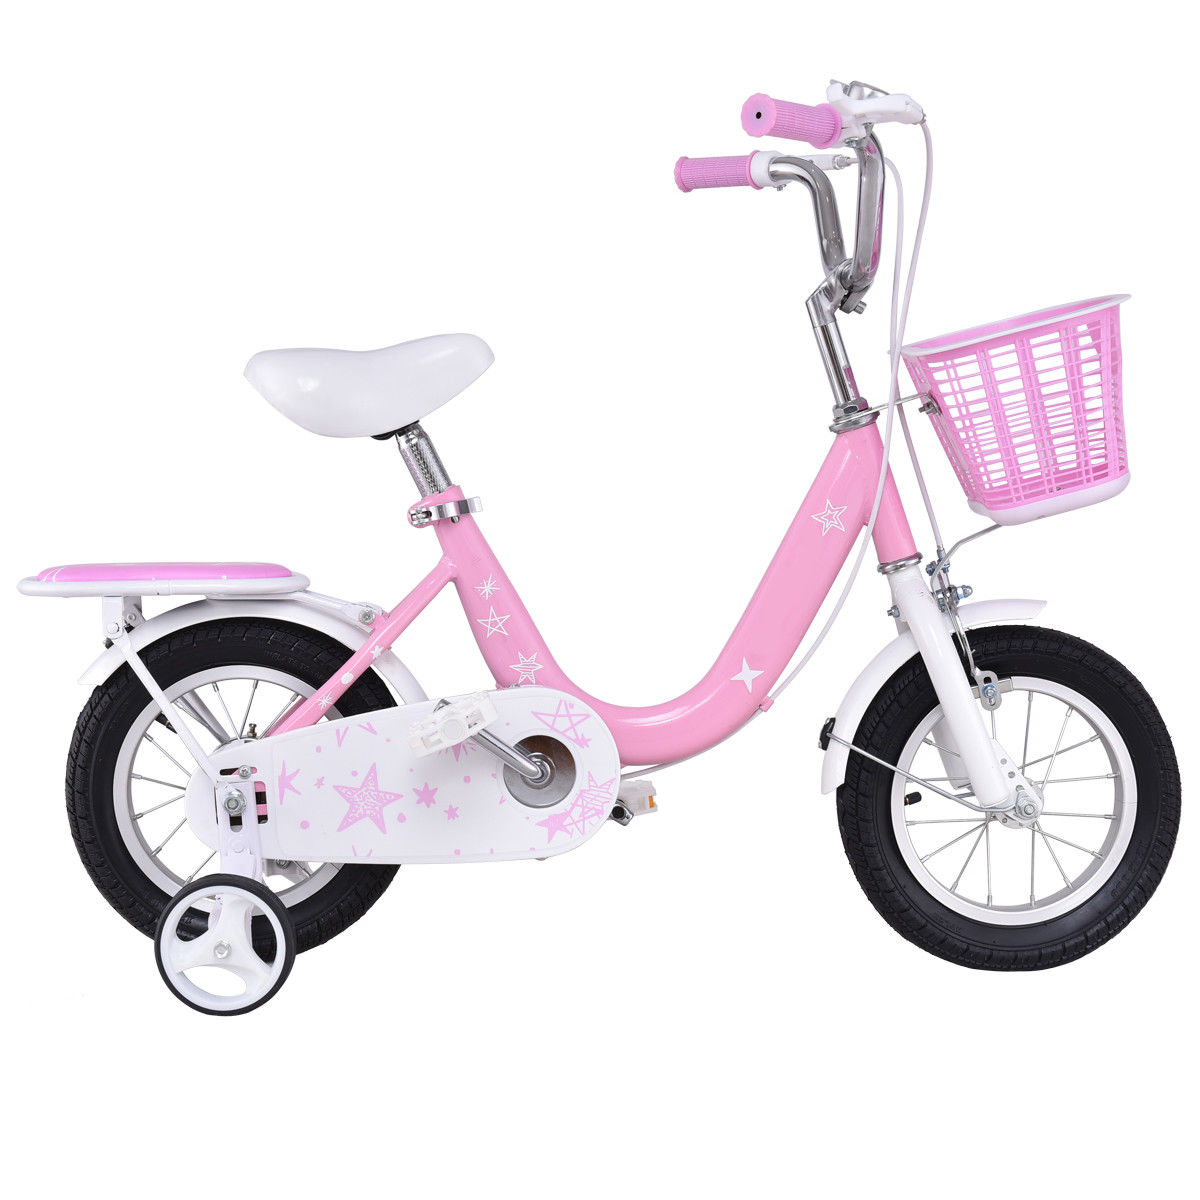 Costway 12'' Kids Bike Bicycle Children Boys & Girls with...